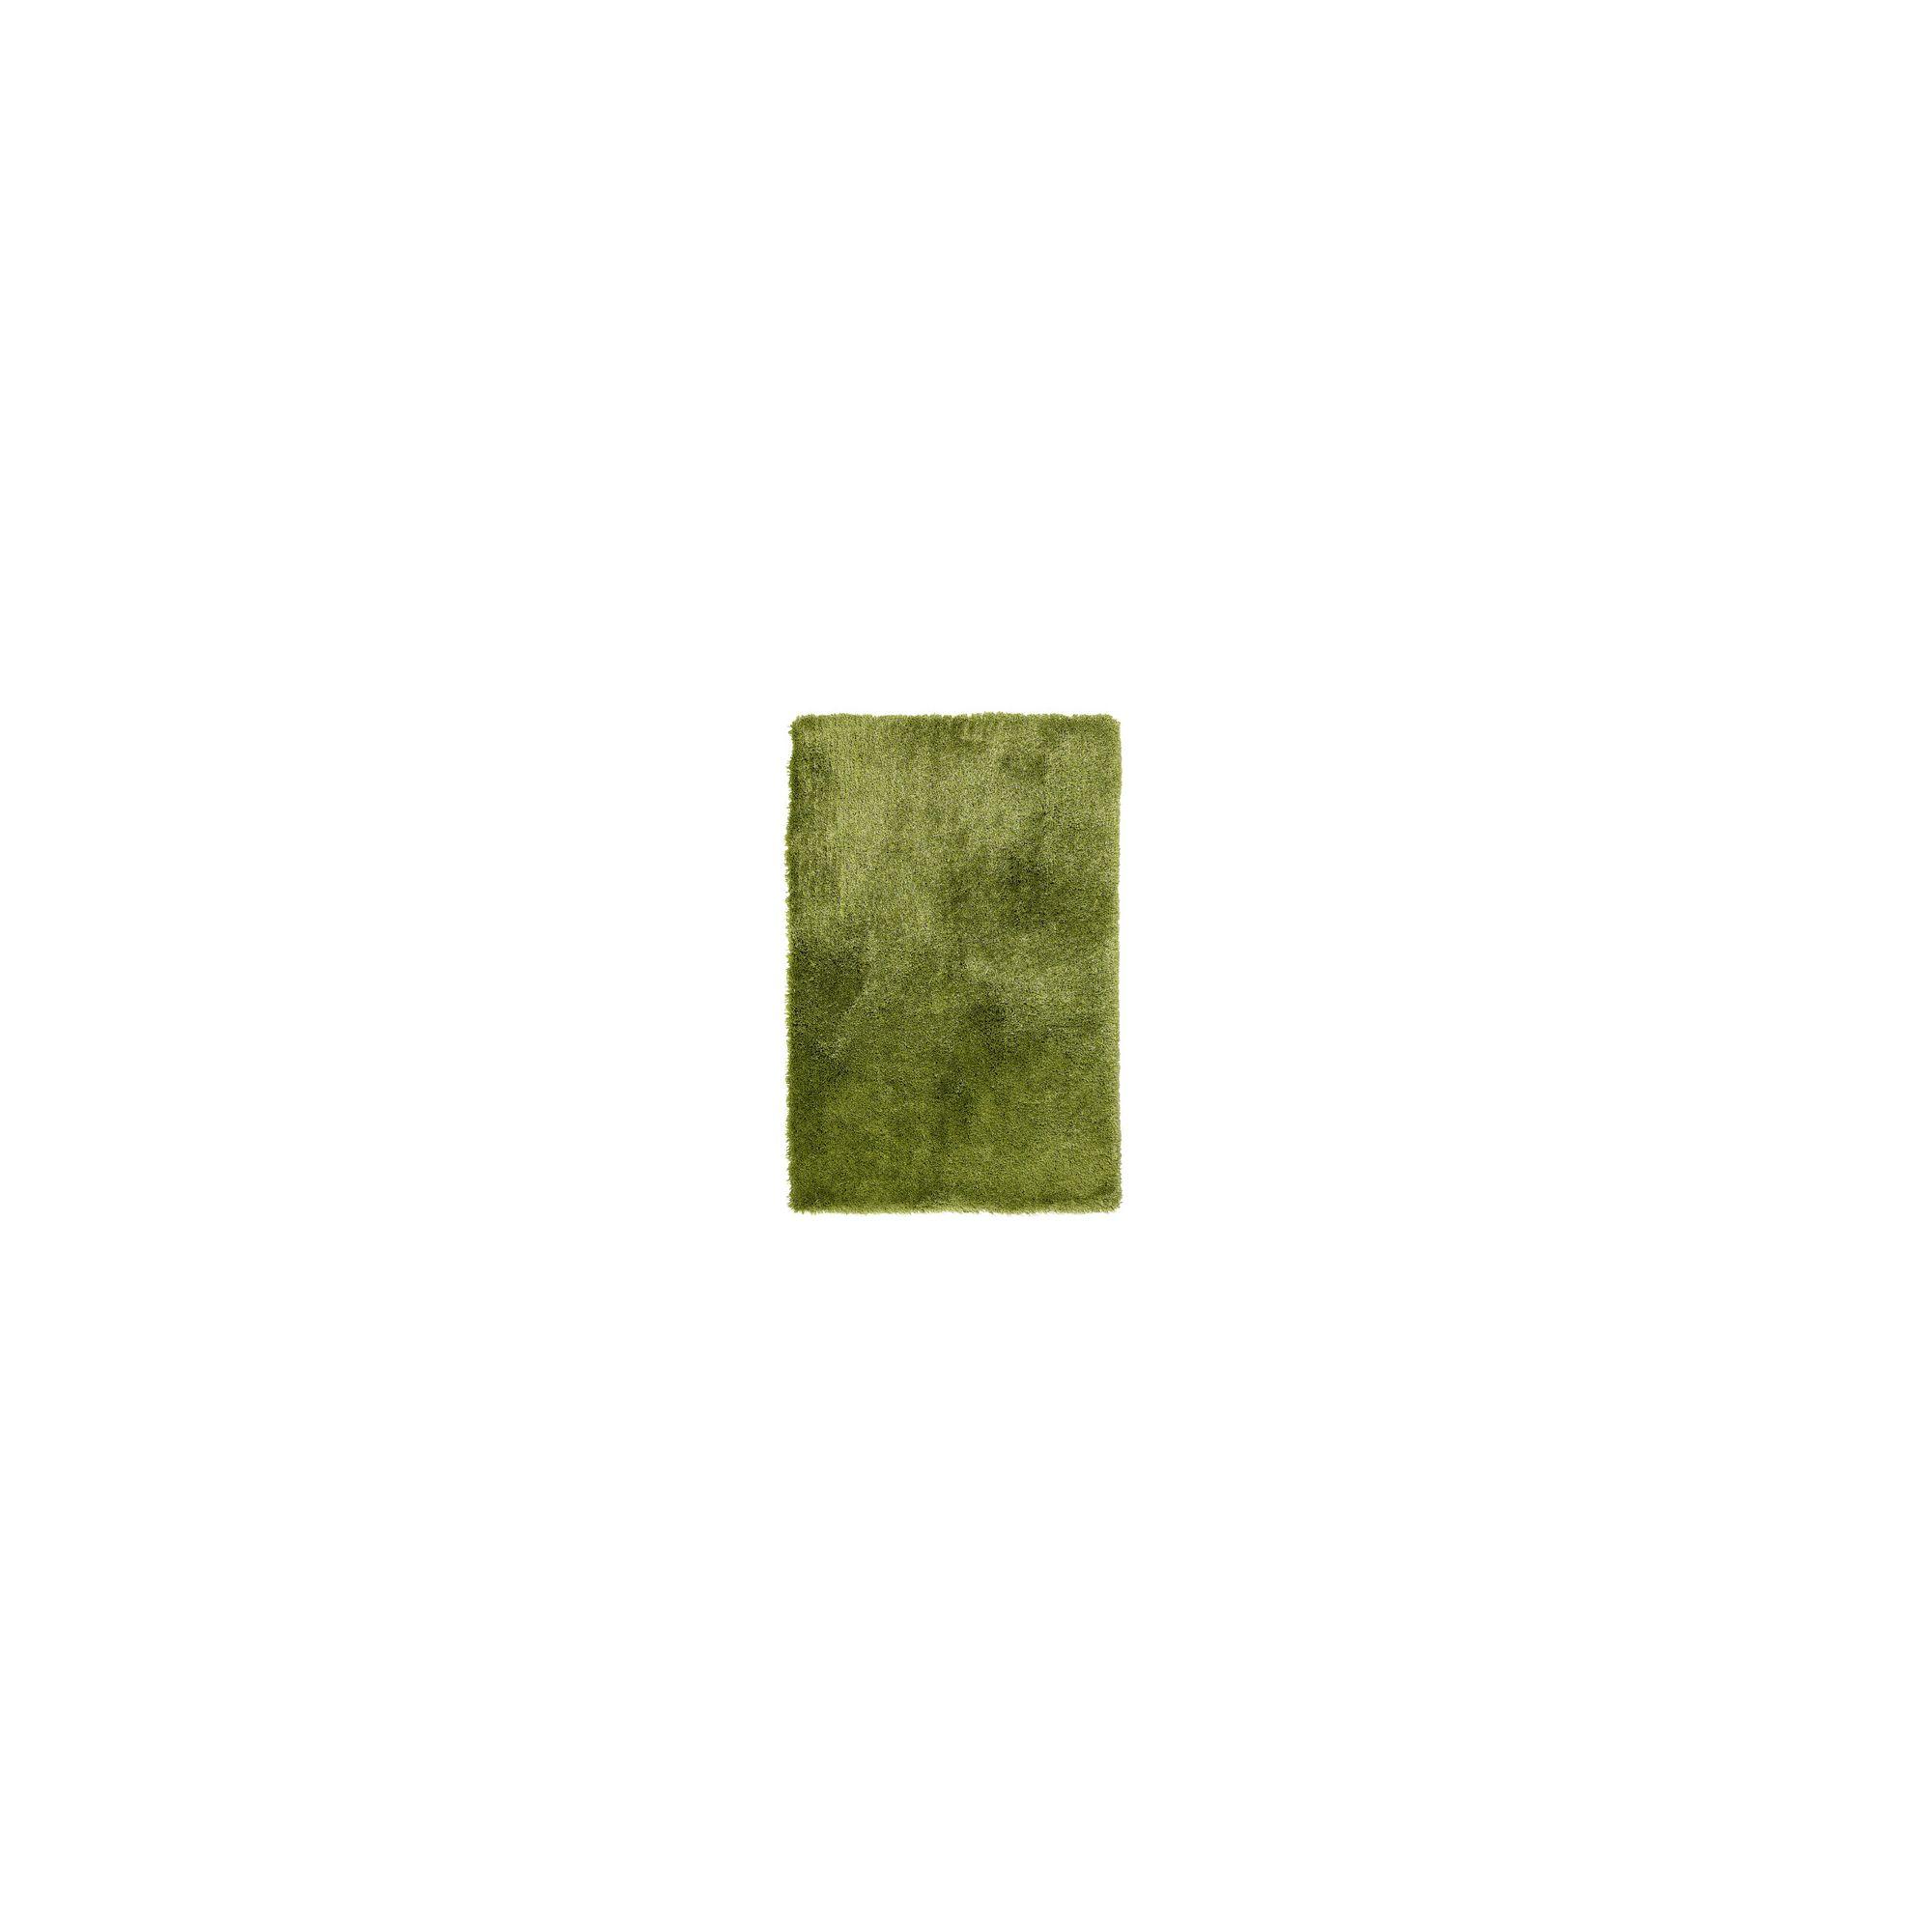 Oriental Carpets & Rugs Arctic Green Tufted Rug - 150cm L x 90cm W